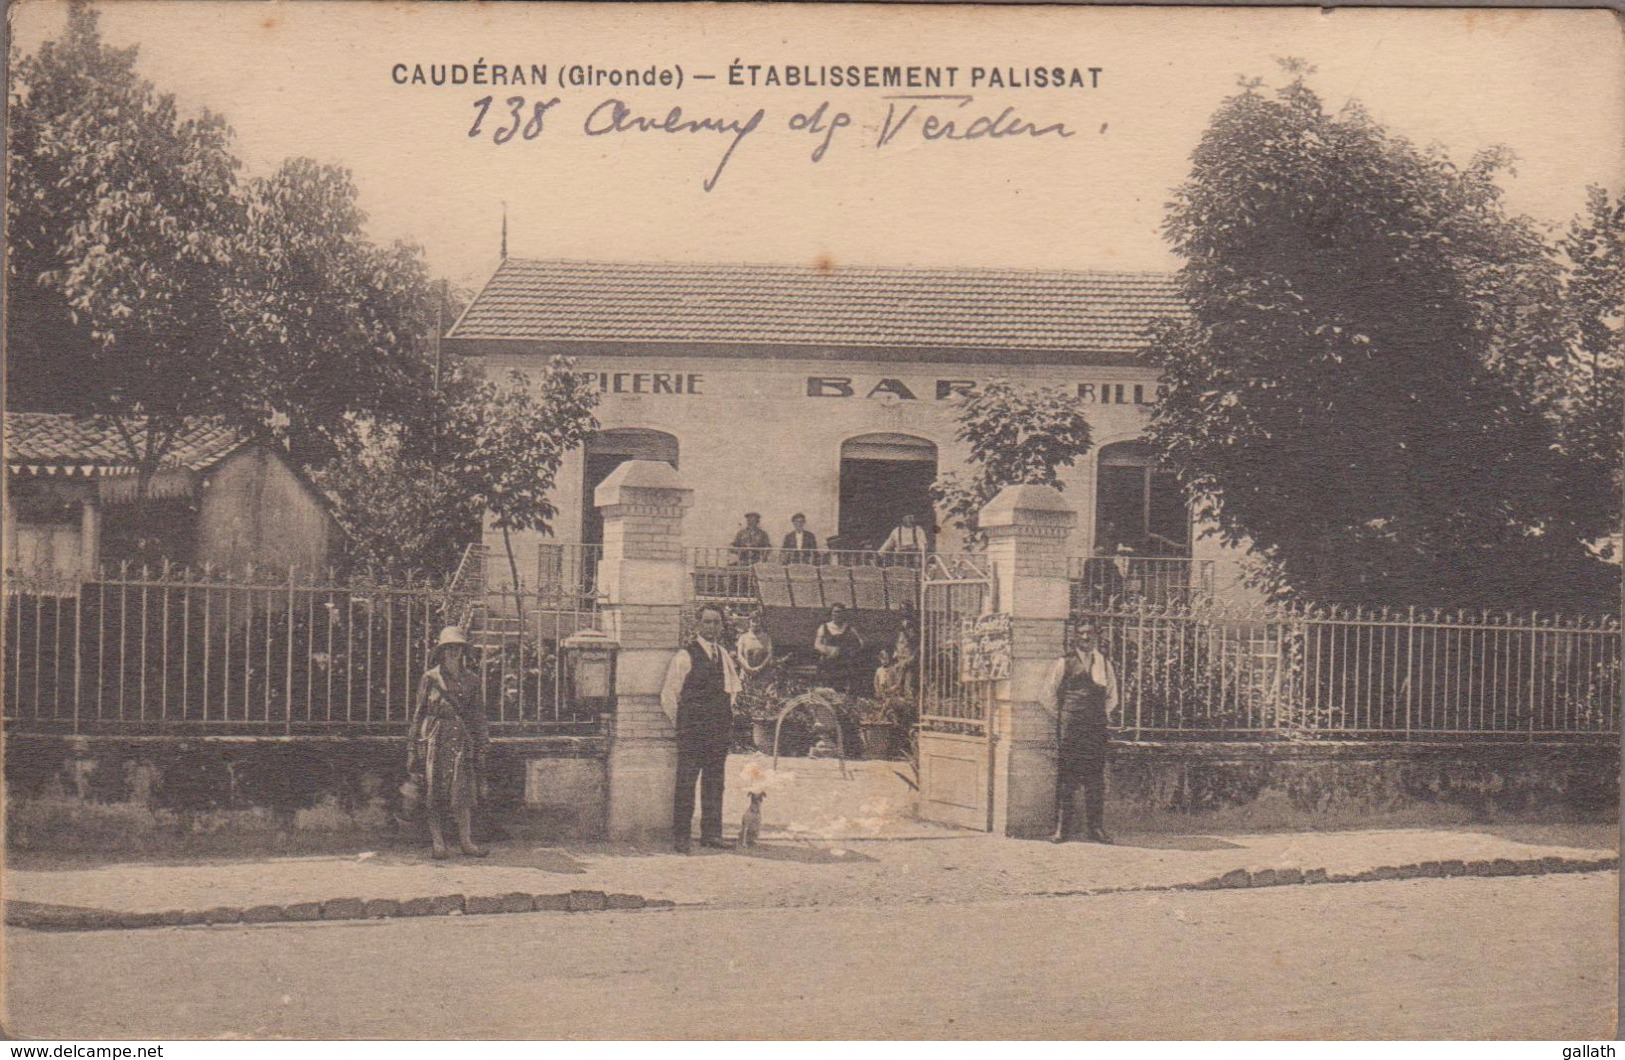 33200-CAUDERAN-Etablissement PALISSAT, 138 Avenue De Verdun...  Animé Bar, Epicerie, Billard 1936 (verso Timbre Décollé) - France